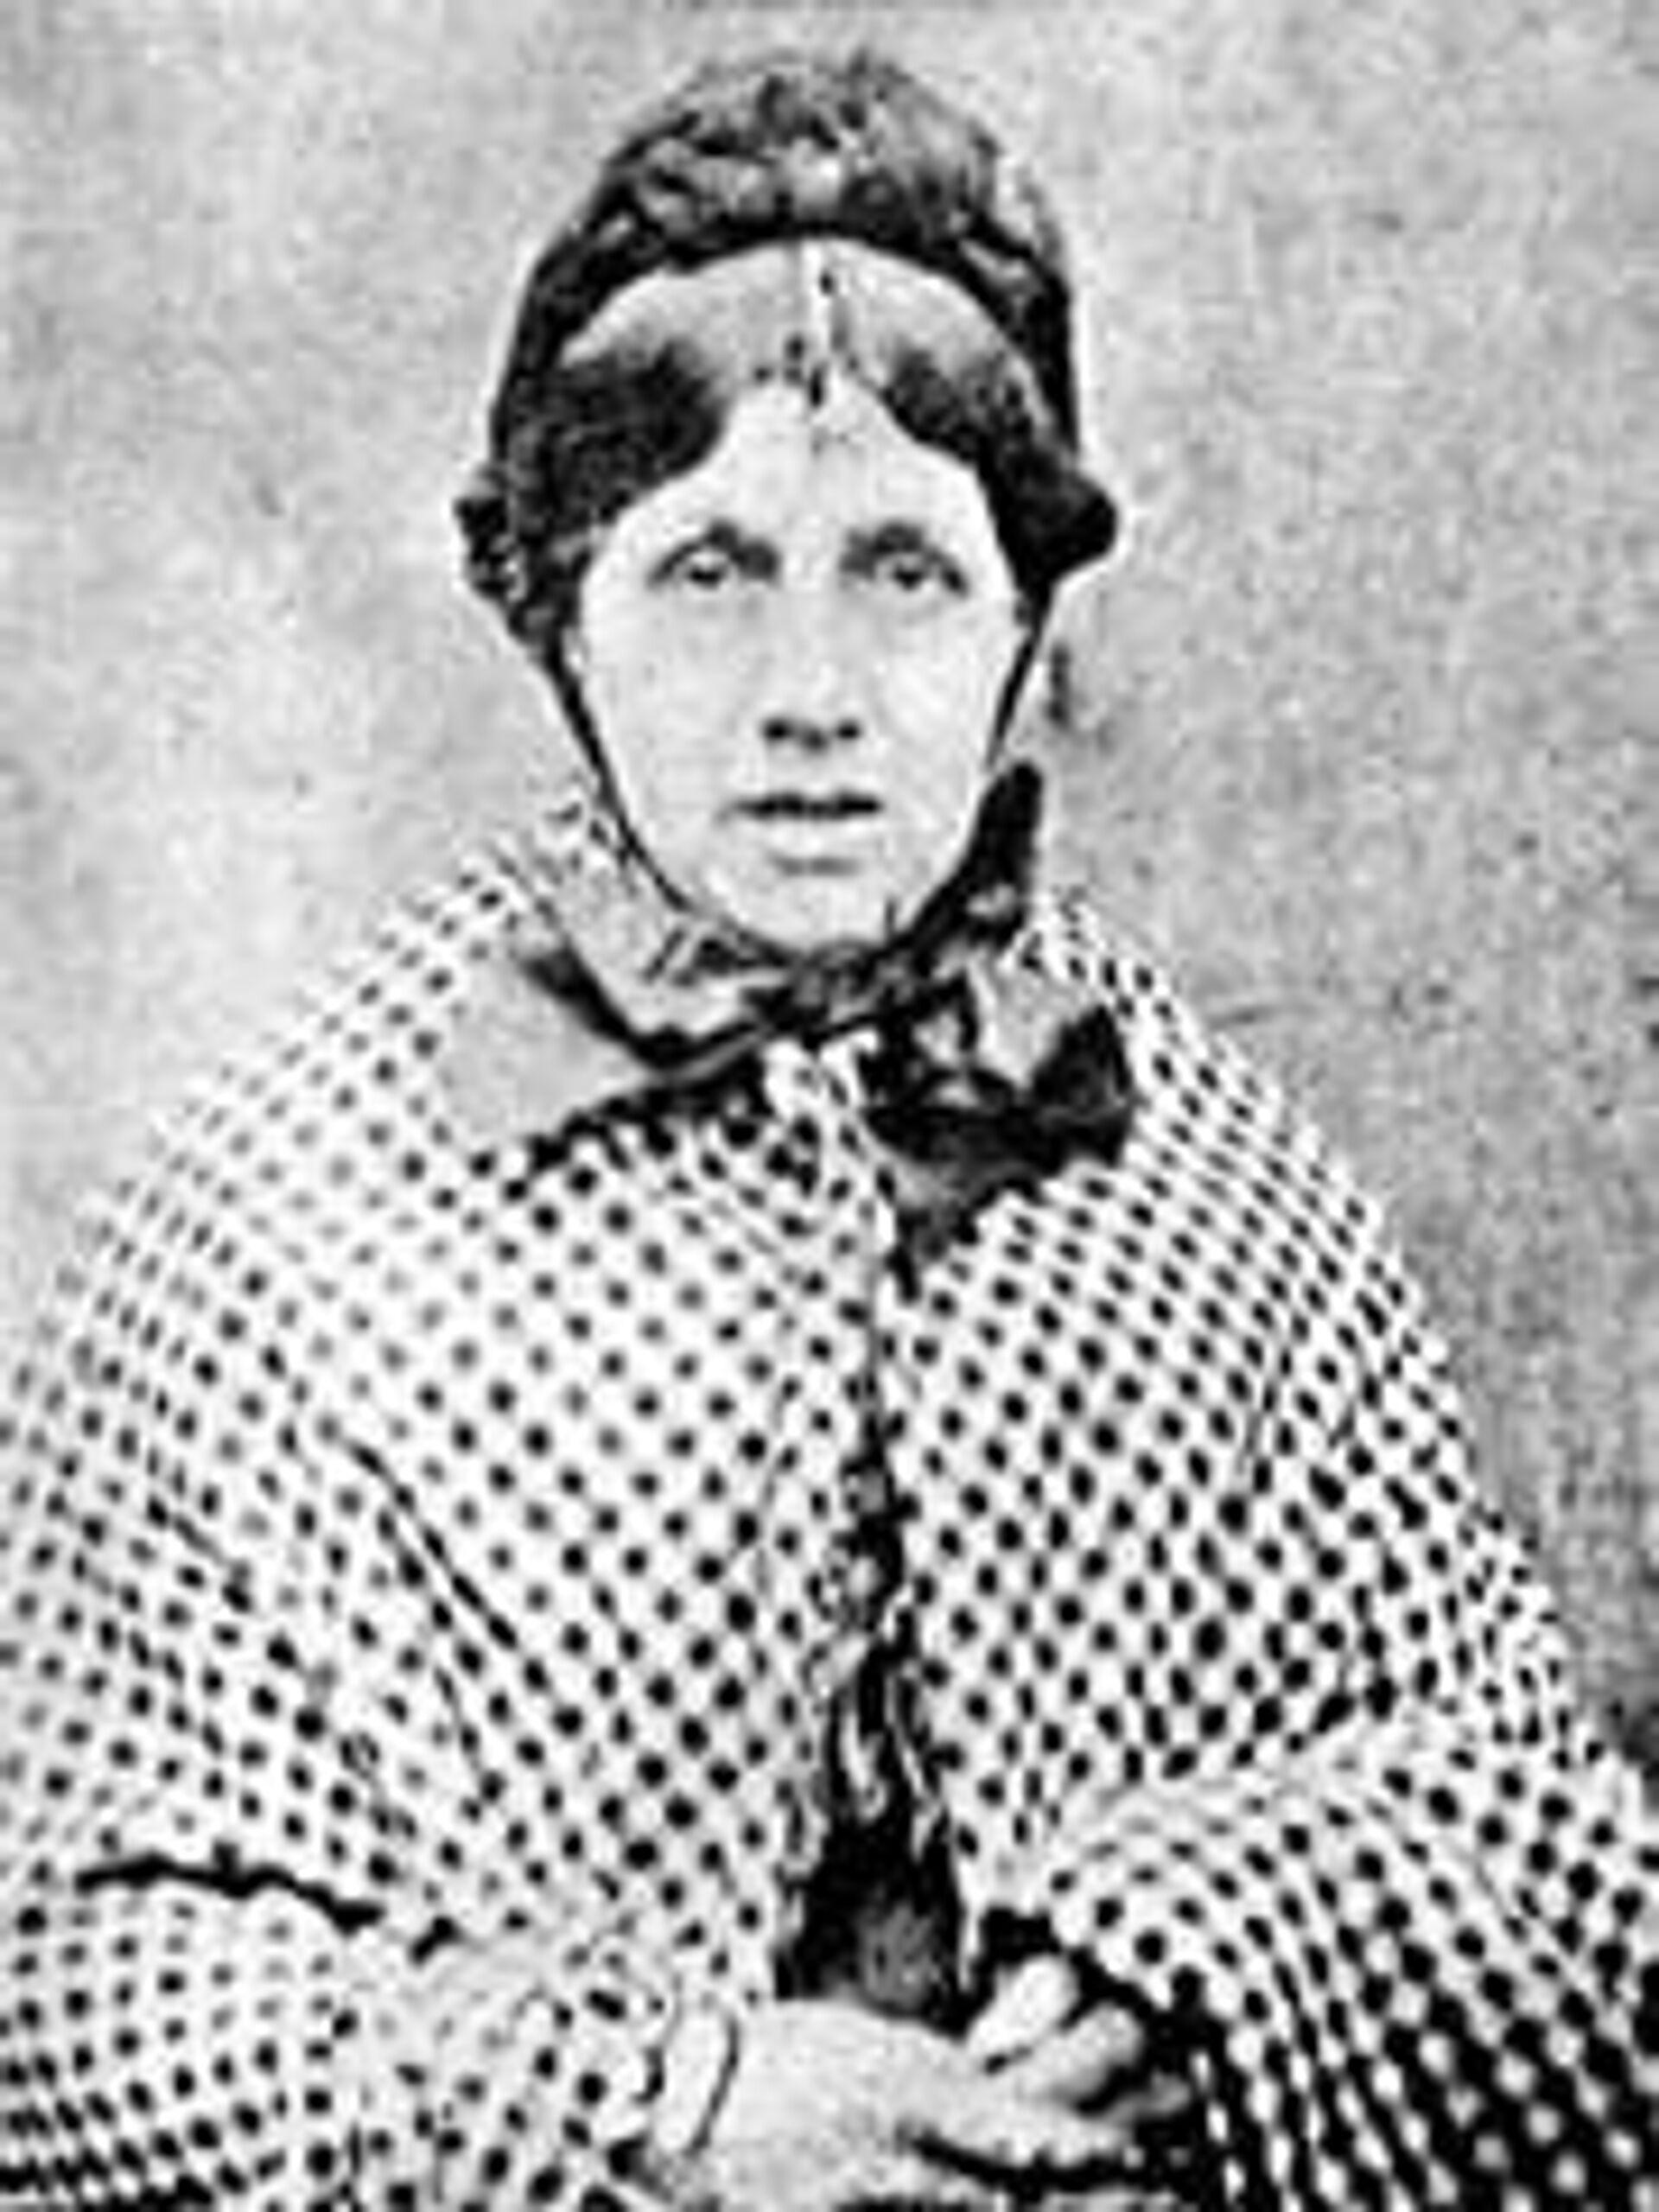 Mary Ann Cotton, um 1870 - SNA, 1920, 23.06.2021